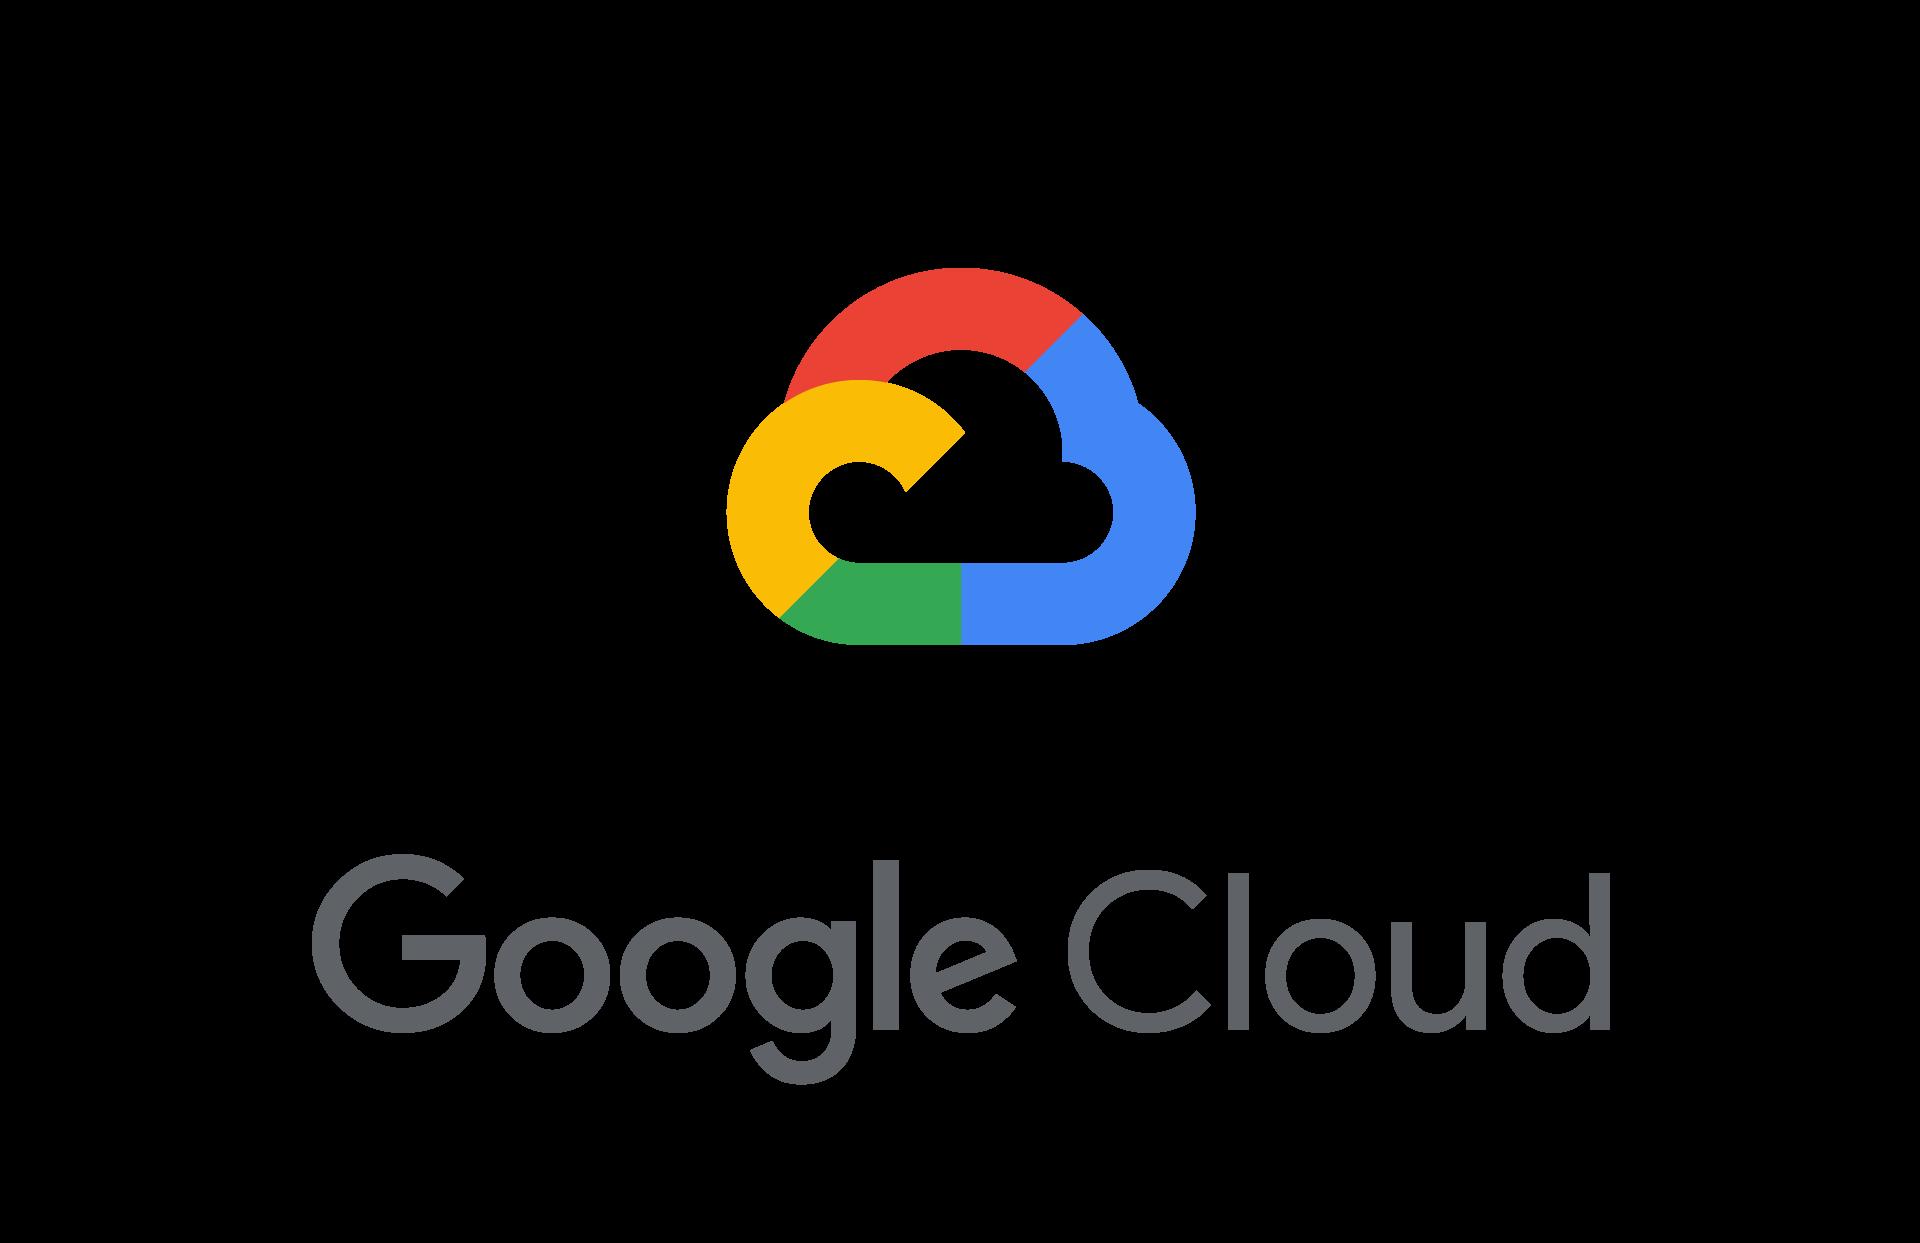 Google Cloud_3.png